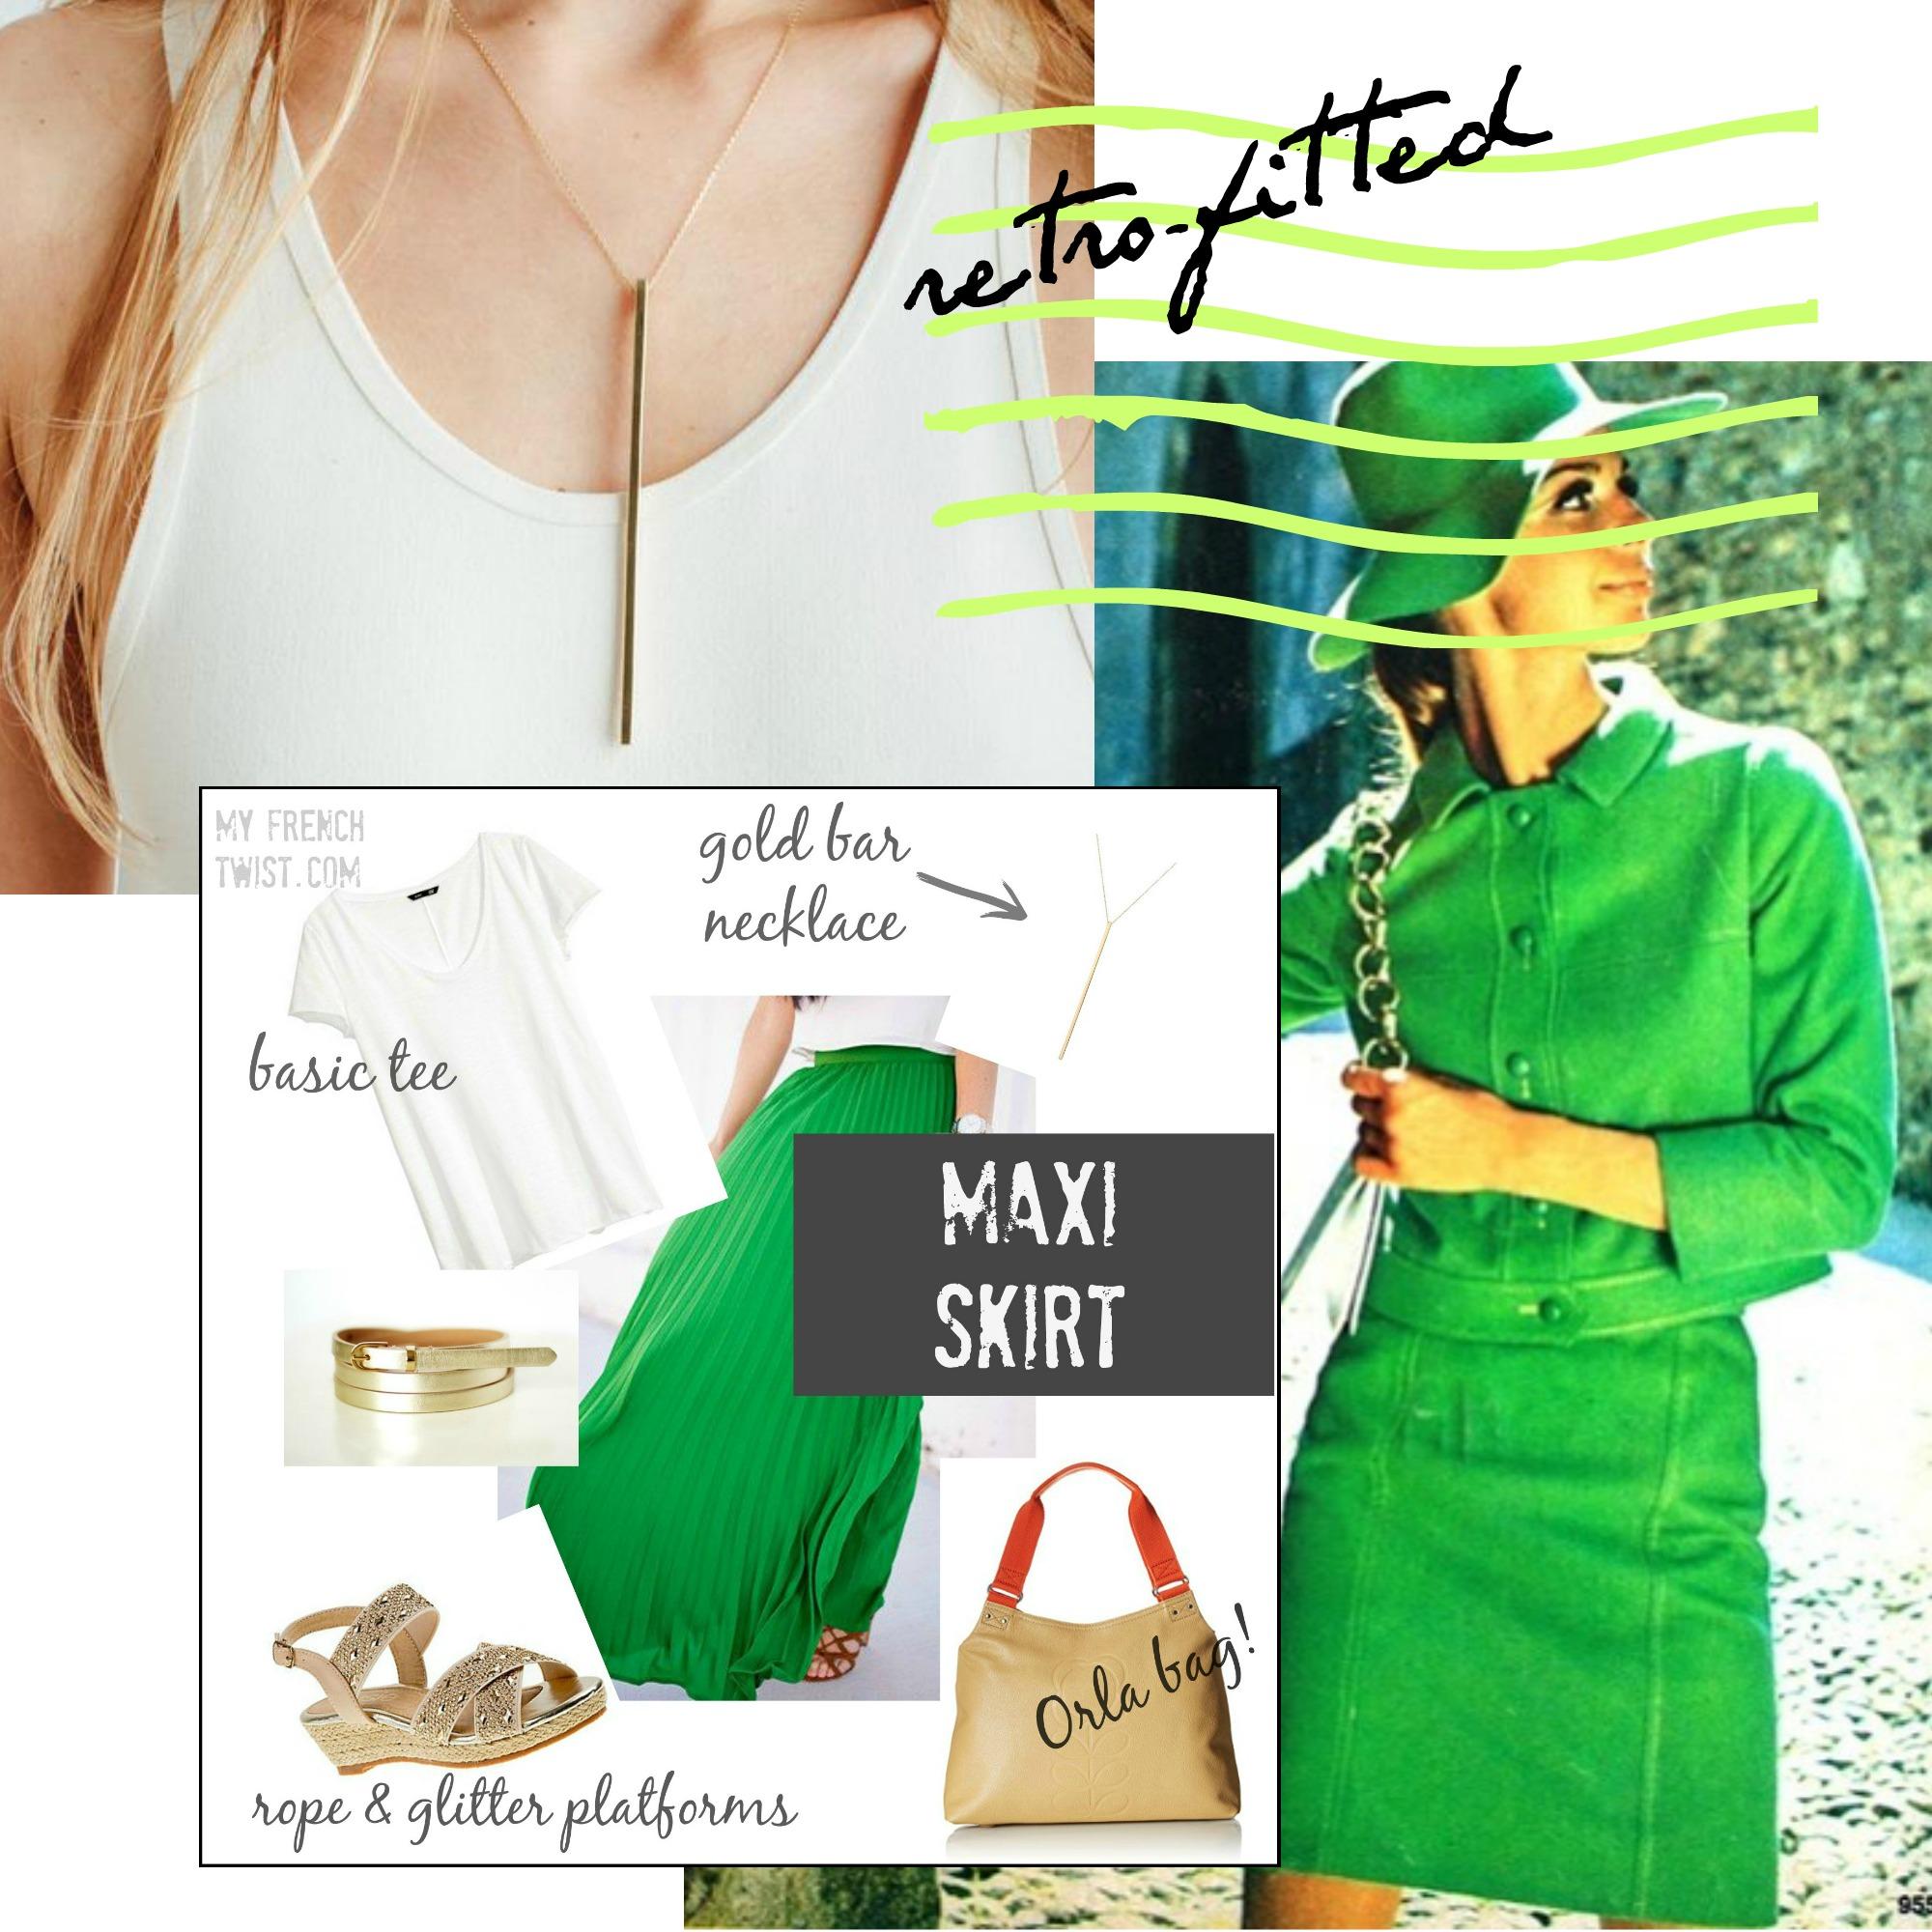 retrofitted - shades of green - myfrenchtwist.com